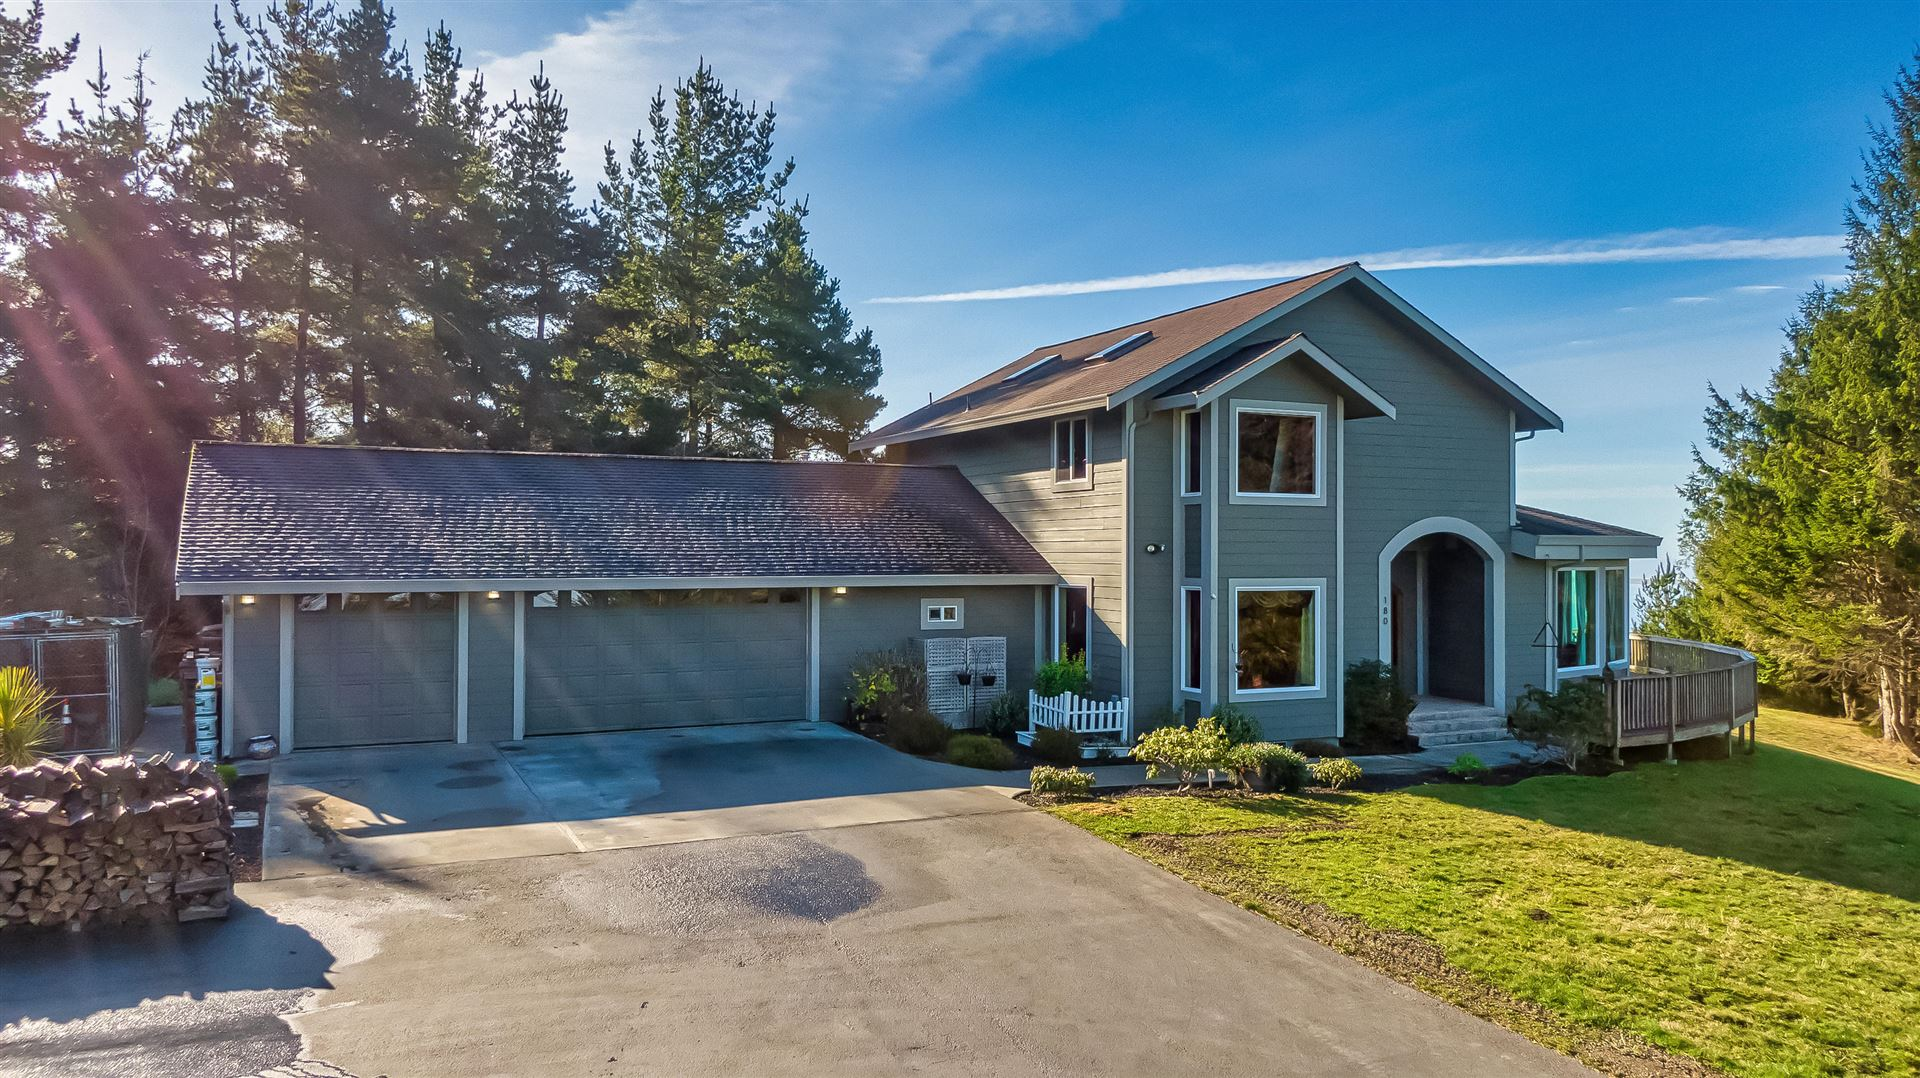 180 Blue Spruce Drive, Eureka, CA 95503 - MLS#: 258087